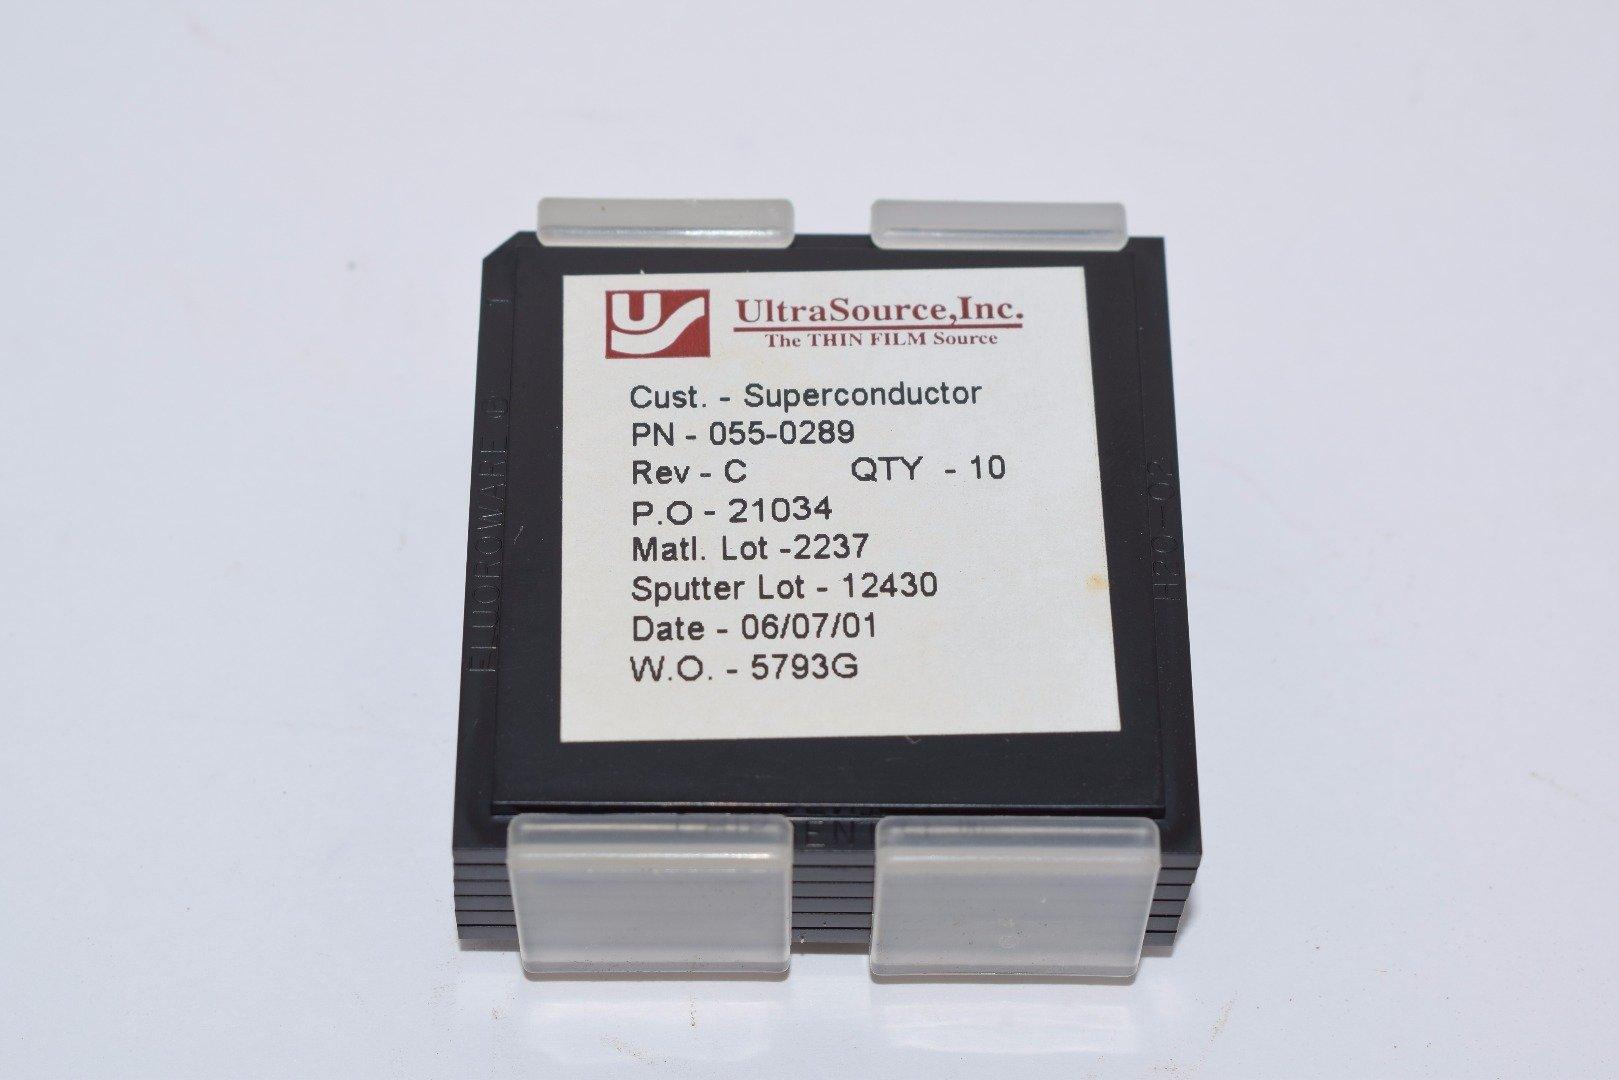 Lot of 10 NEW Superconductor UltraSource 055-0289 Rev C Thin Film Sensor